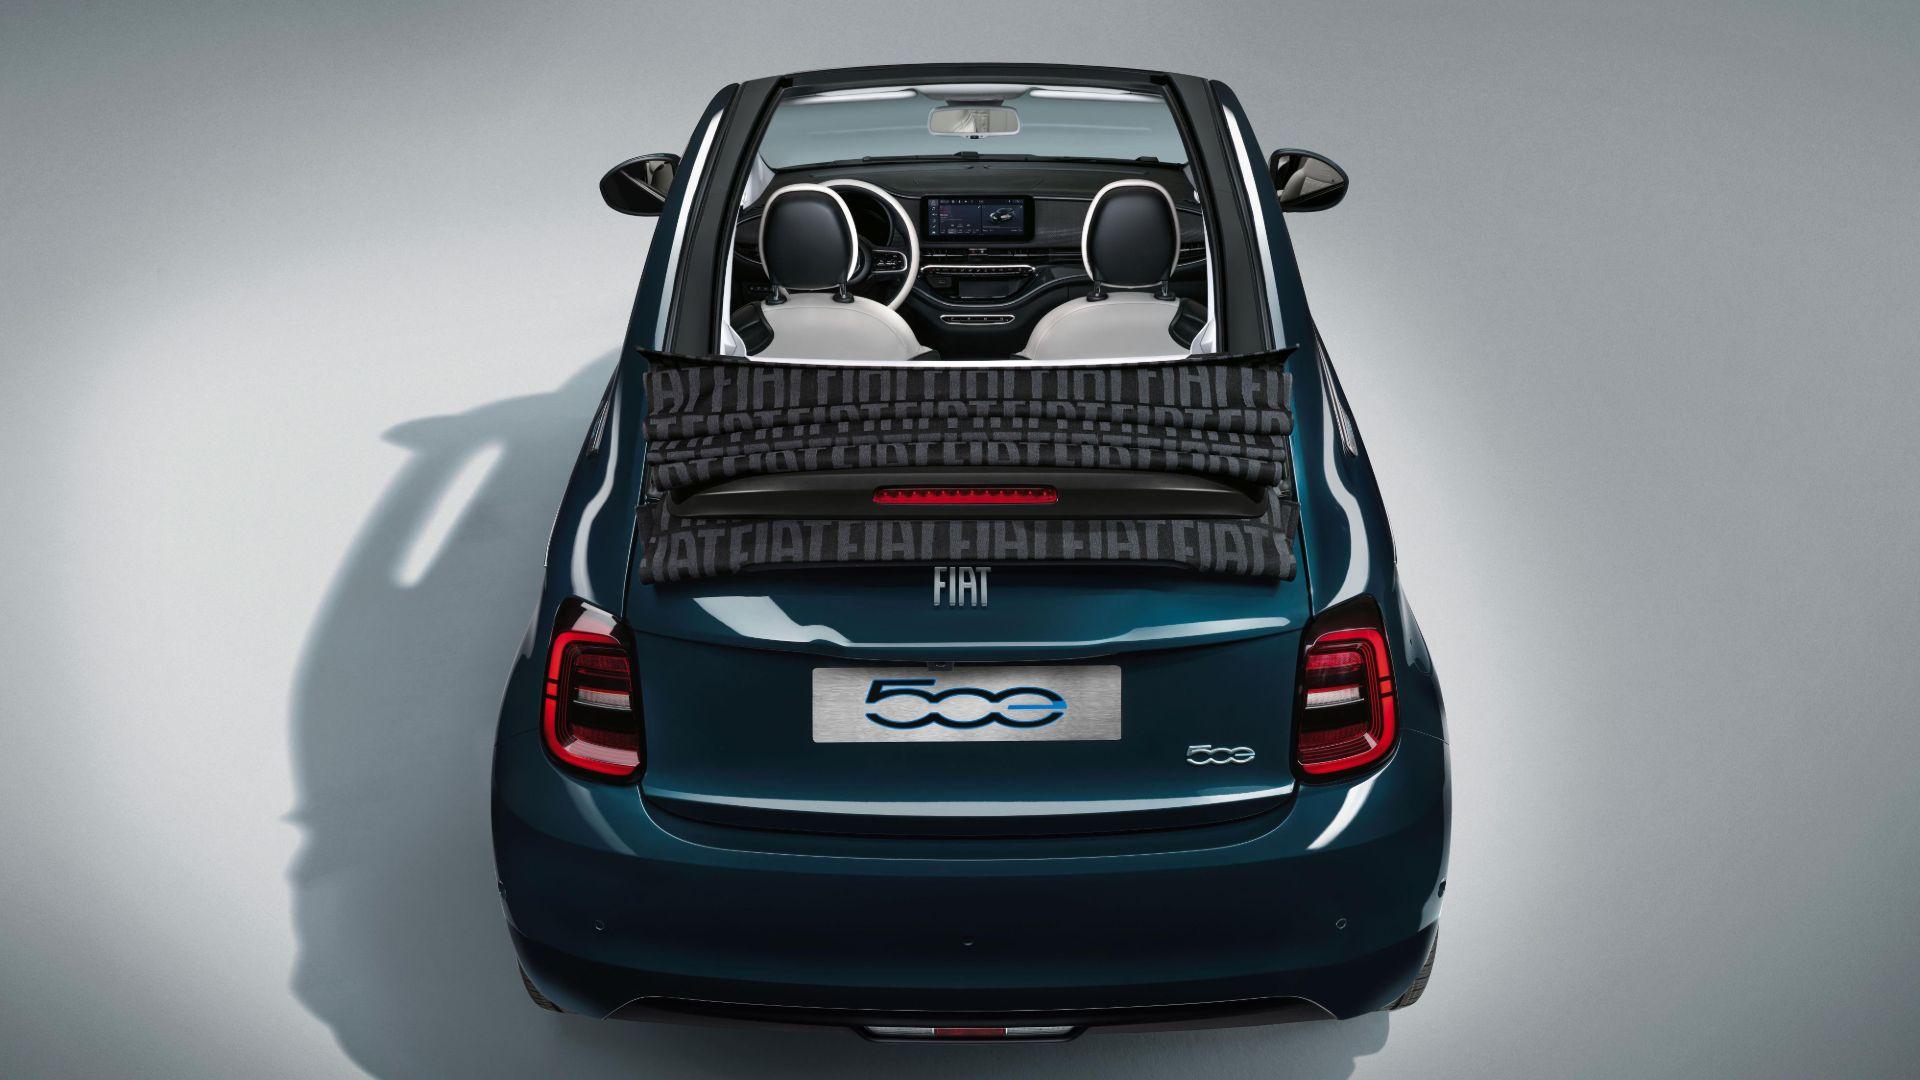 2020 Fiat 500 revealed